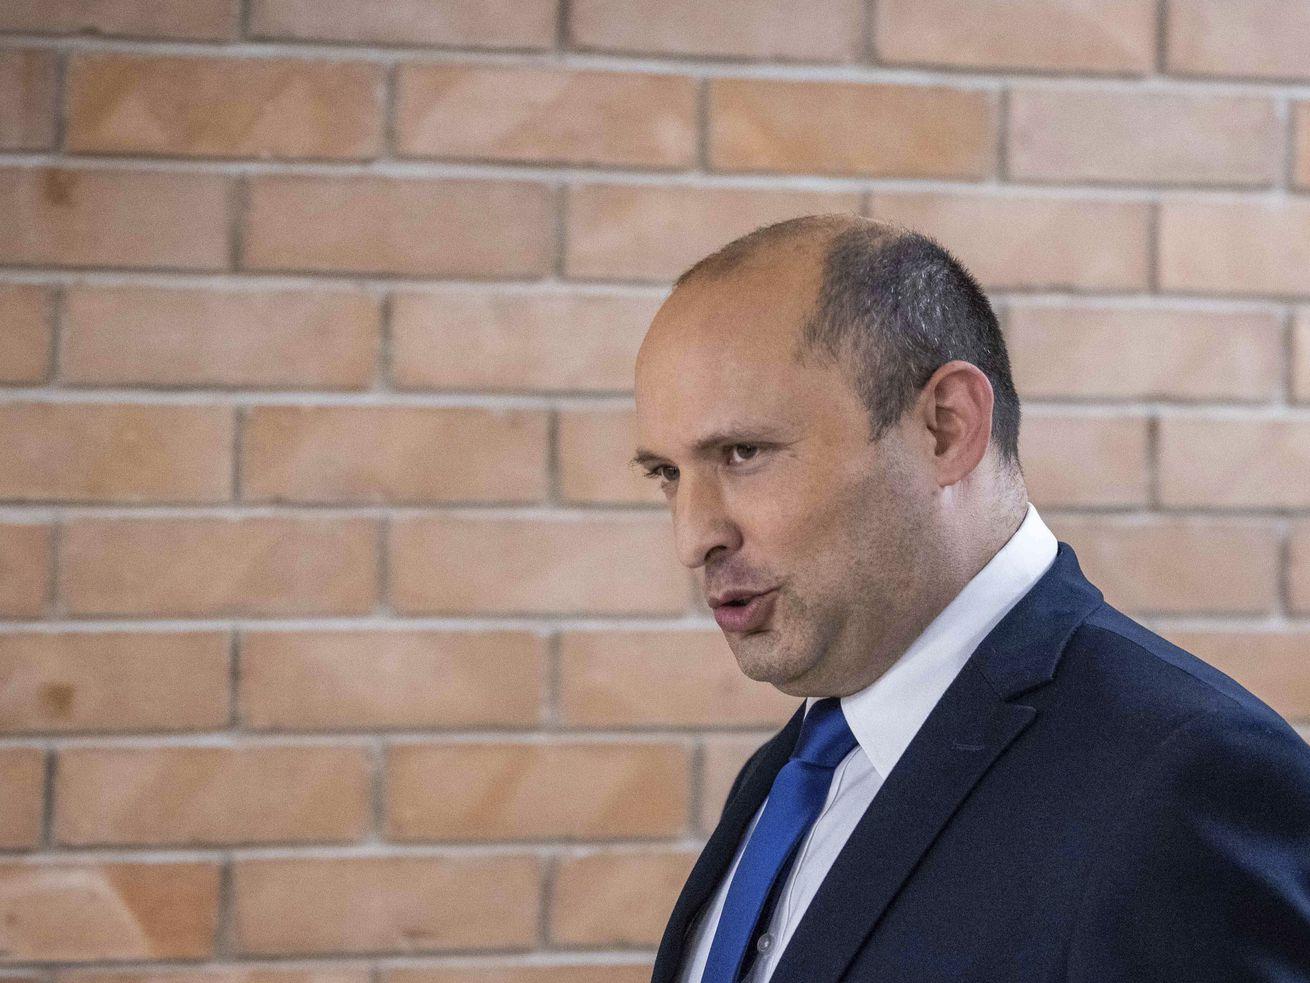 Yemina party leader Naftali Bennett arrives to speaks to the Israeli Parliament in Jerusalem, Sunday, May 30, 2021.